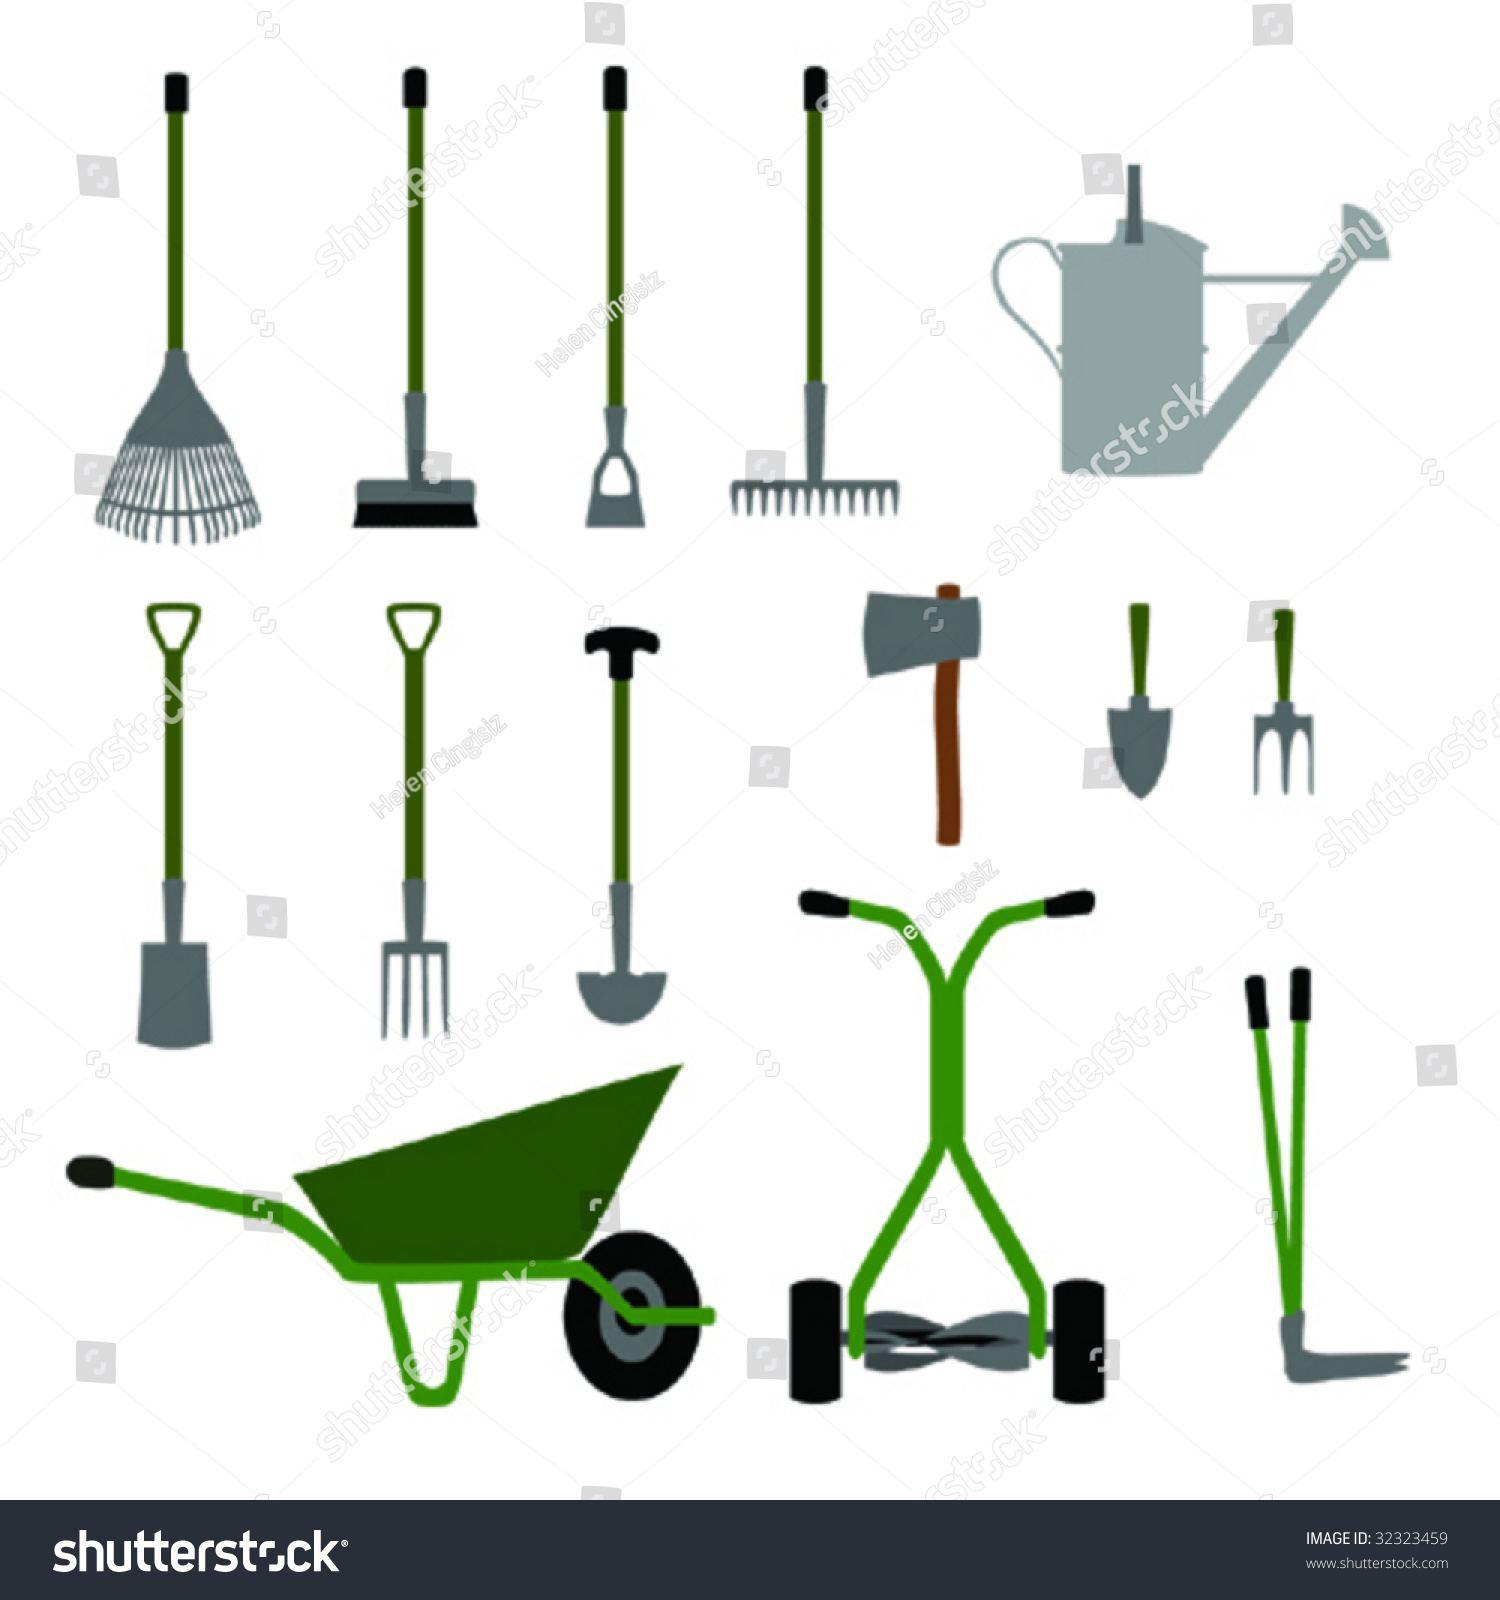 Garden tools - Elegant Gardening tools Equipment Set No1 Stock ...